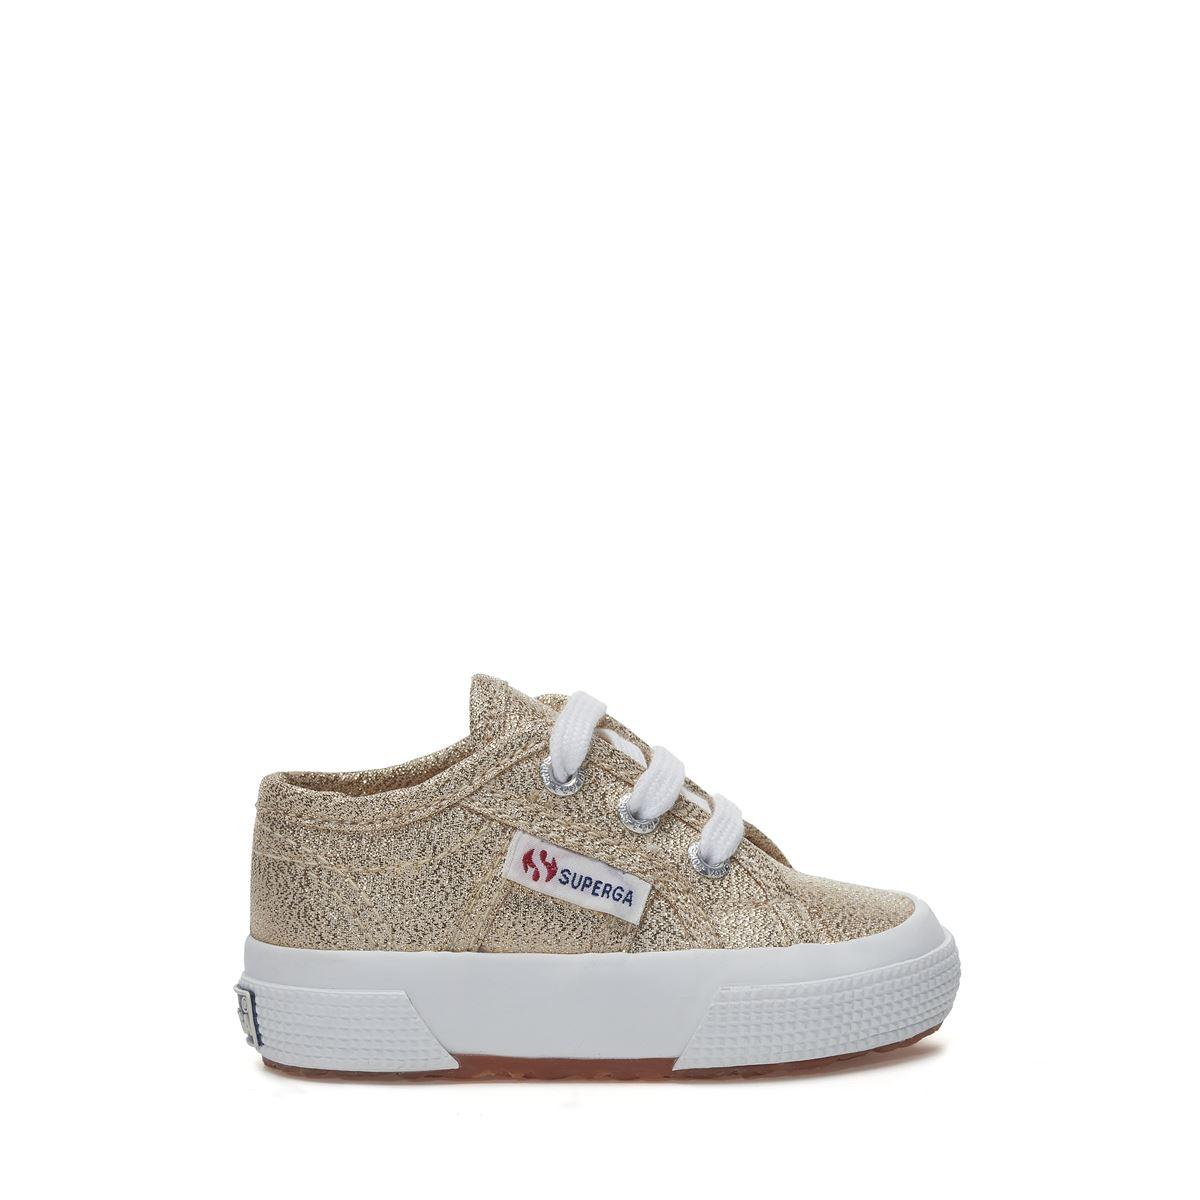 Superga LE SUPERGA 2750-LAMEB KID UNISEX Sneaker